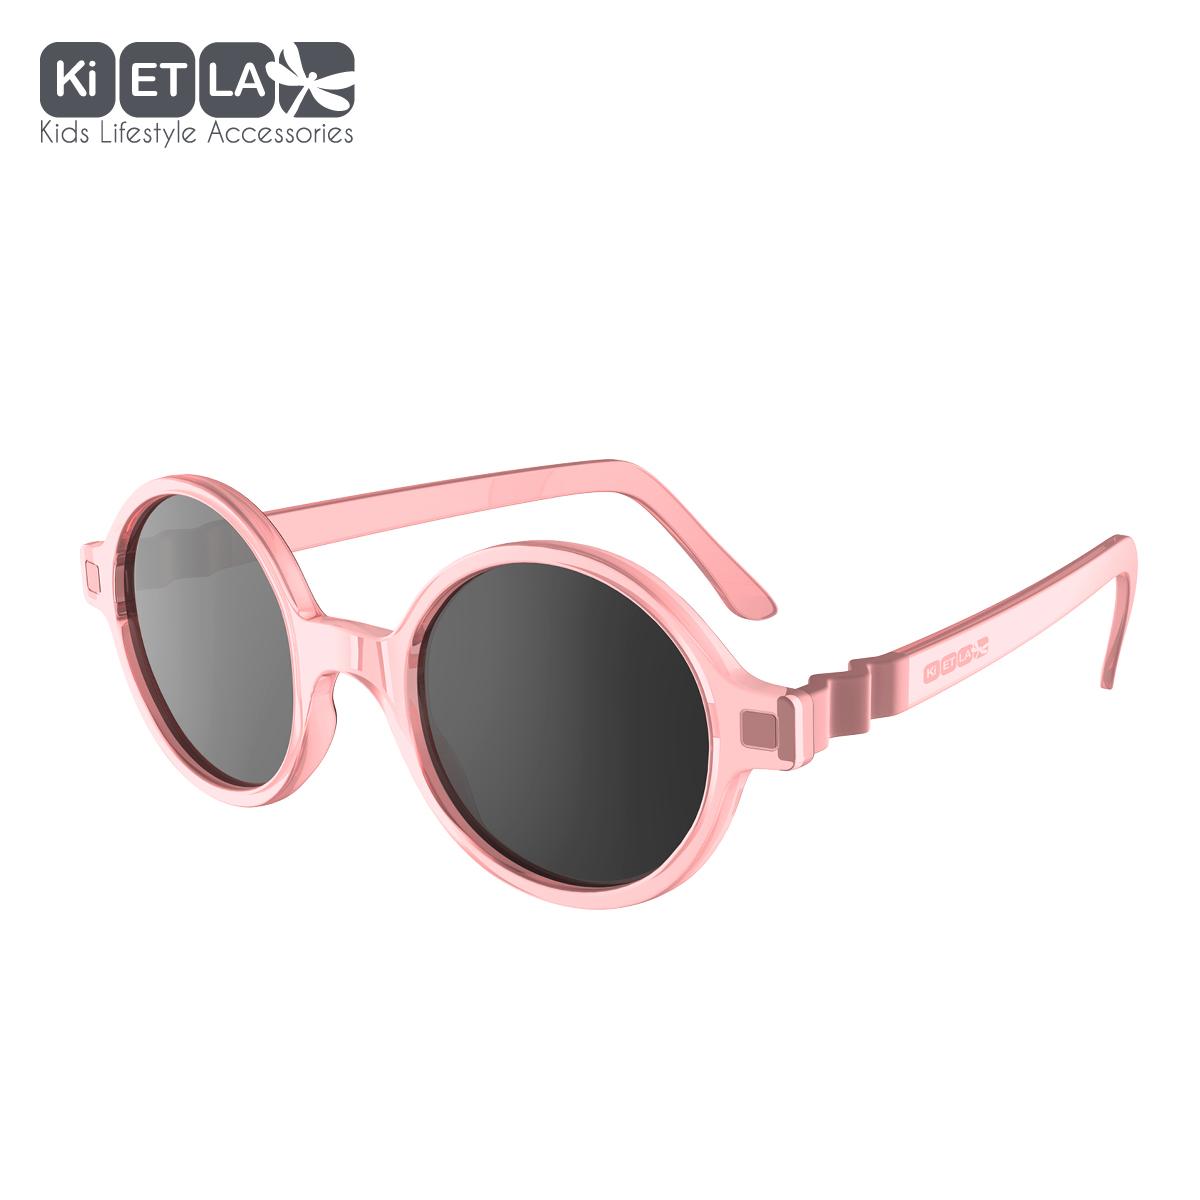 KI ET LA sunglasses CraZyg-Zag SUN Round 6-9y.